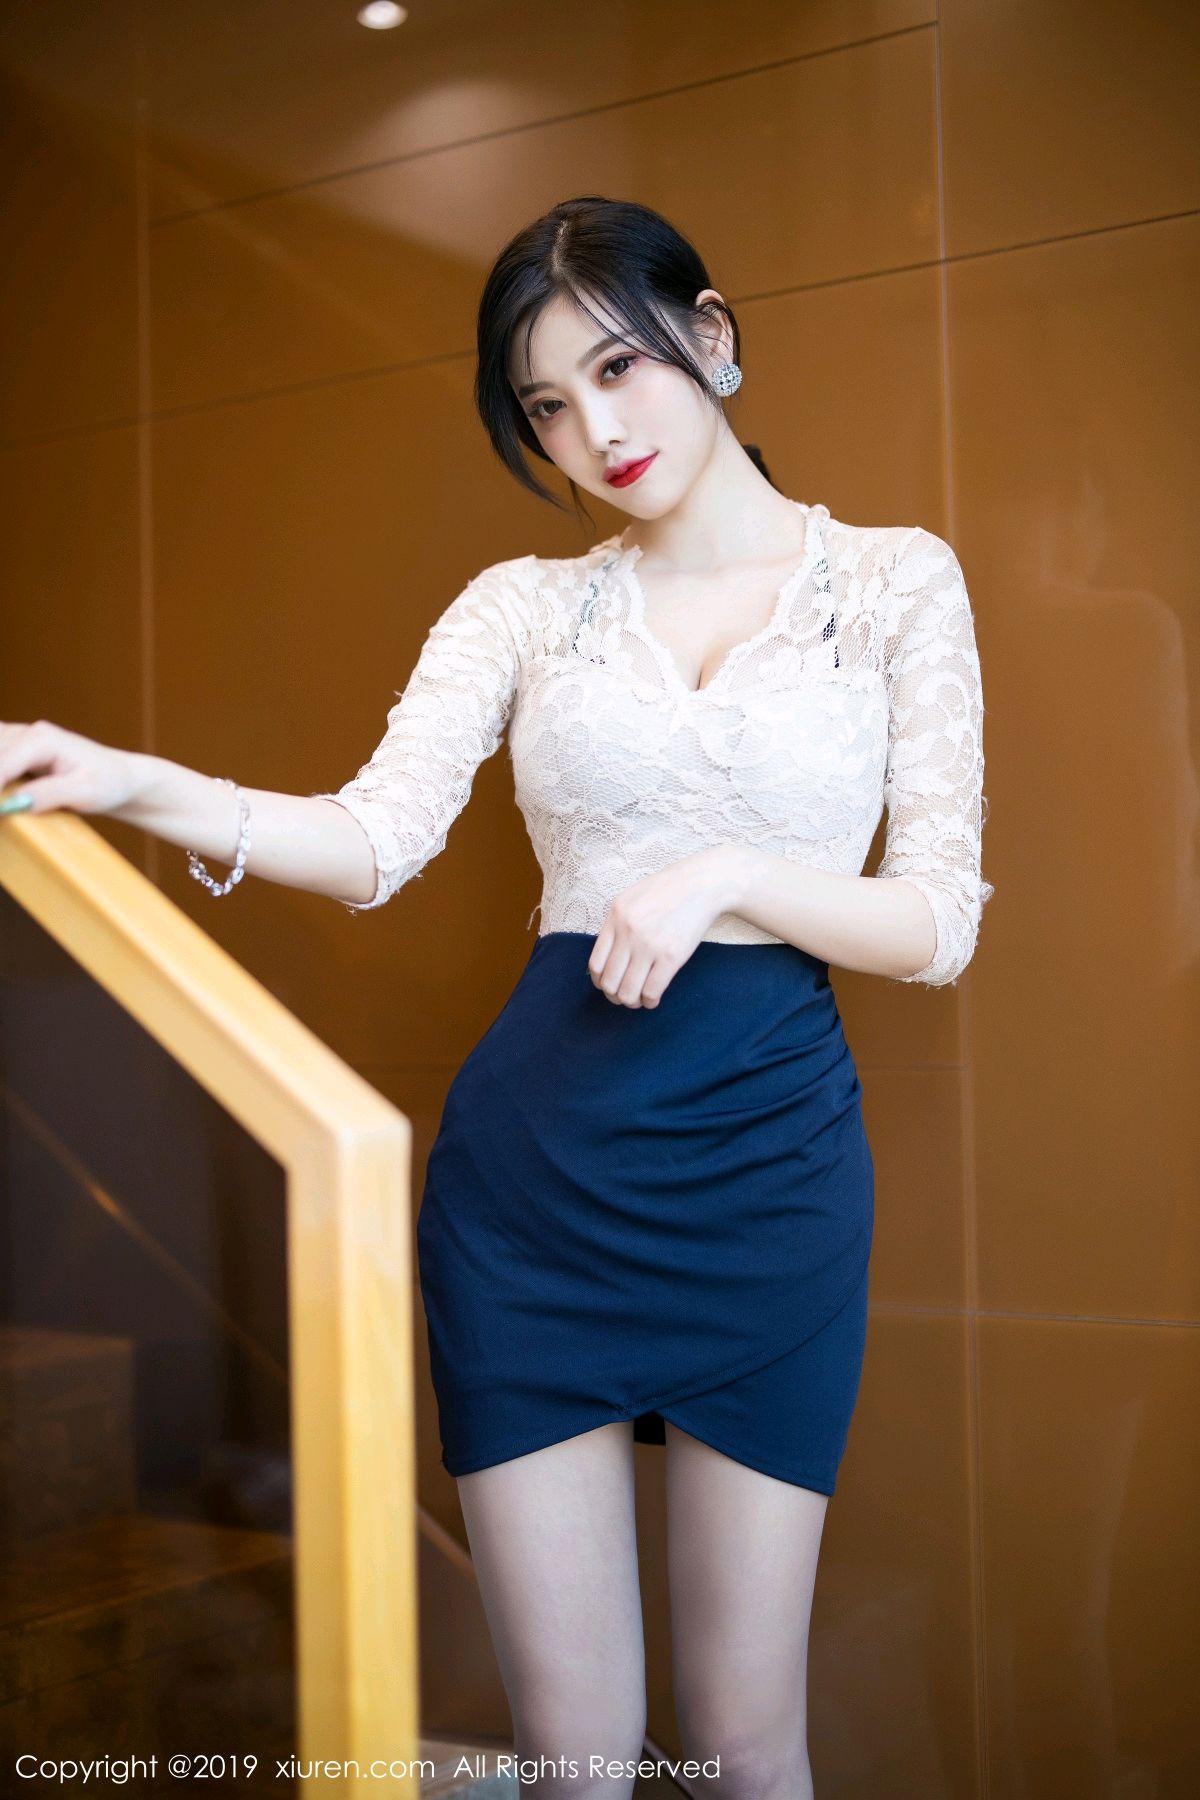 [XiuRen] Vol.1717 Yang Chen Chen 6P, Tall, Underwear, Xiuren, Yang Chen Chen